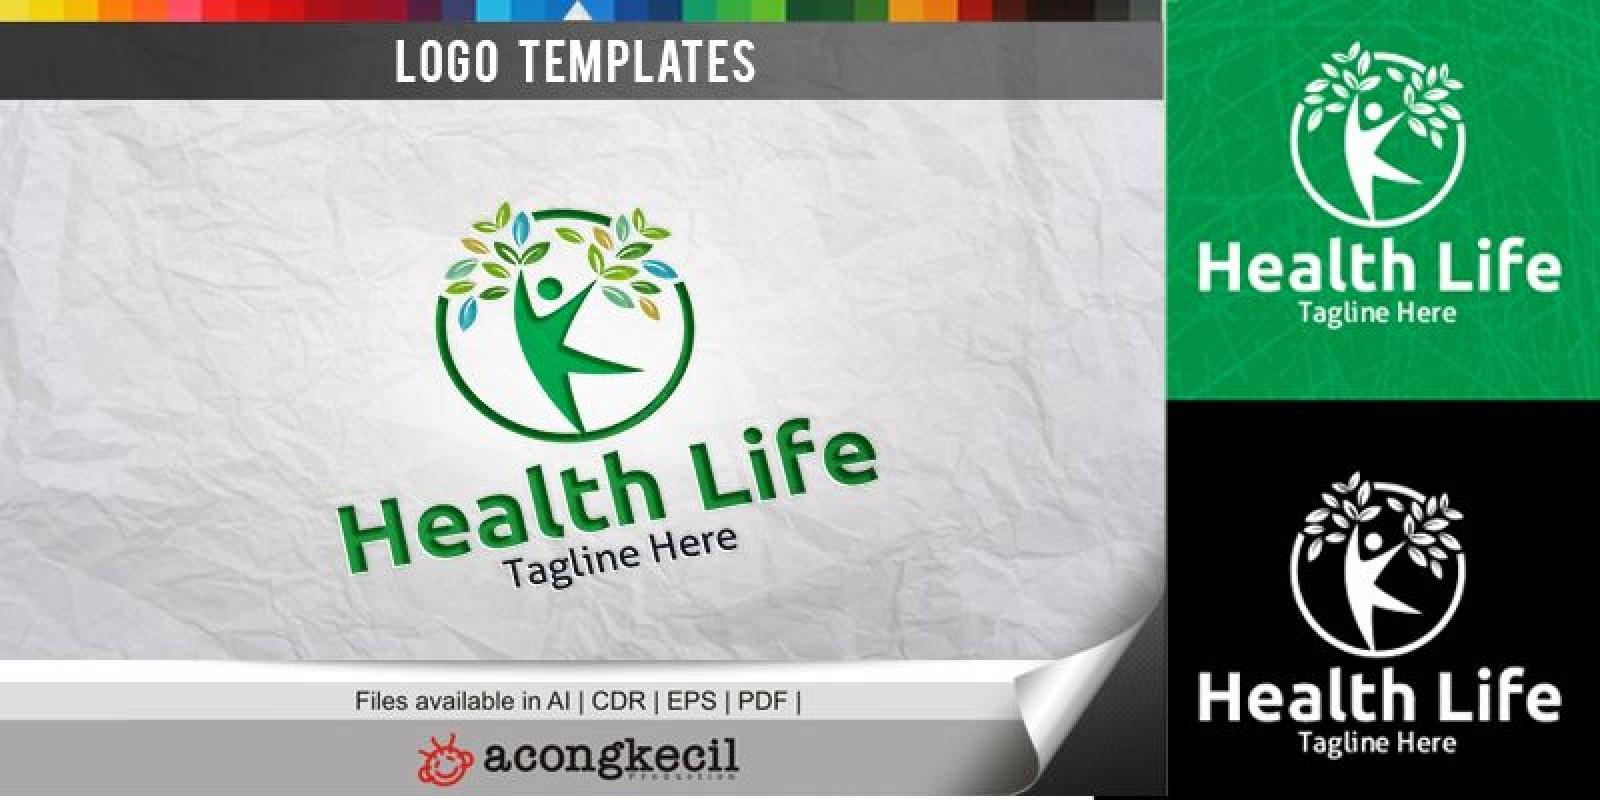 Health Life - Logo Template